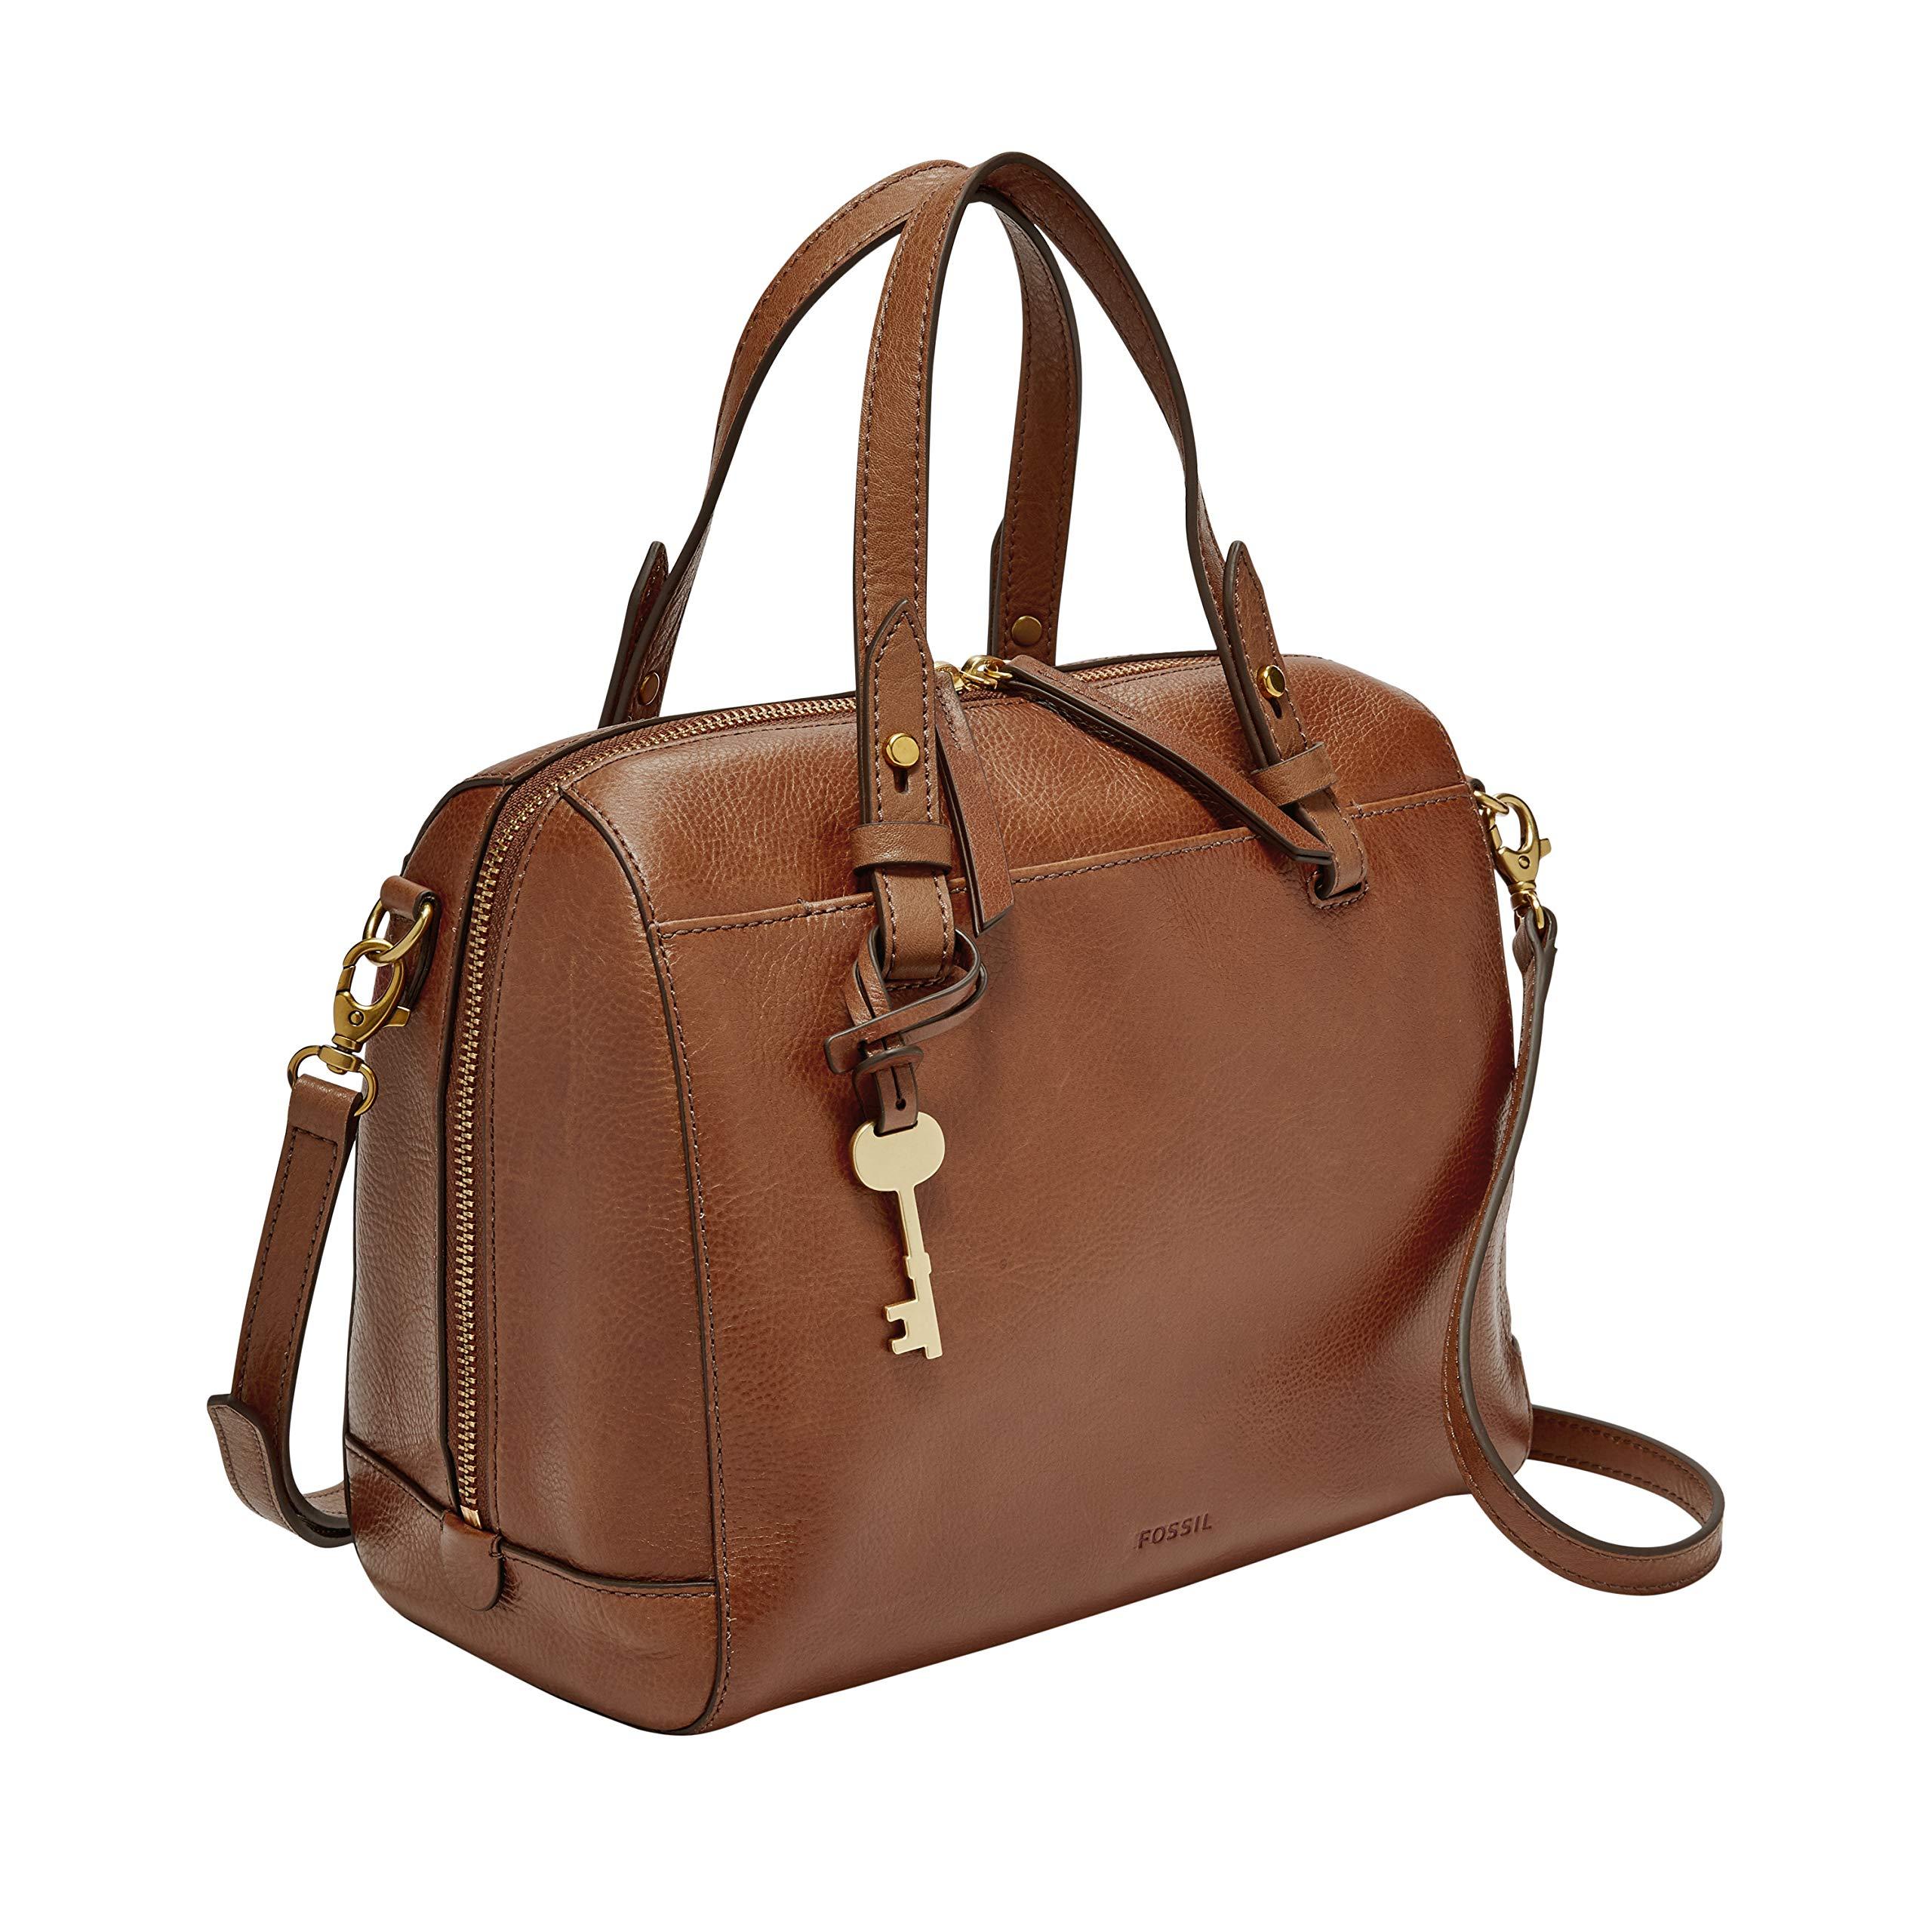 ویکالا · خرید  اصل اورجینال · خرید از آمازون · Fossil Rachel Satchel Handbag, medium brown wekala · ویکالا